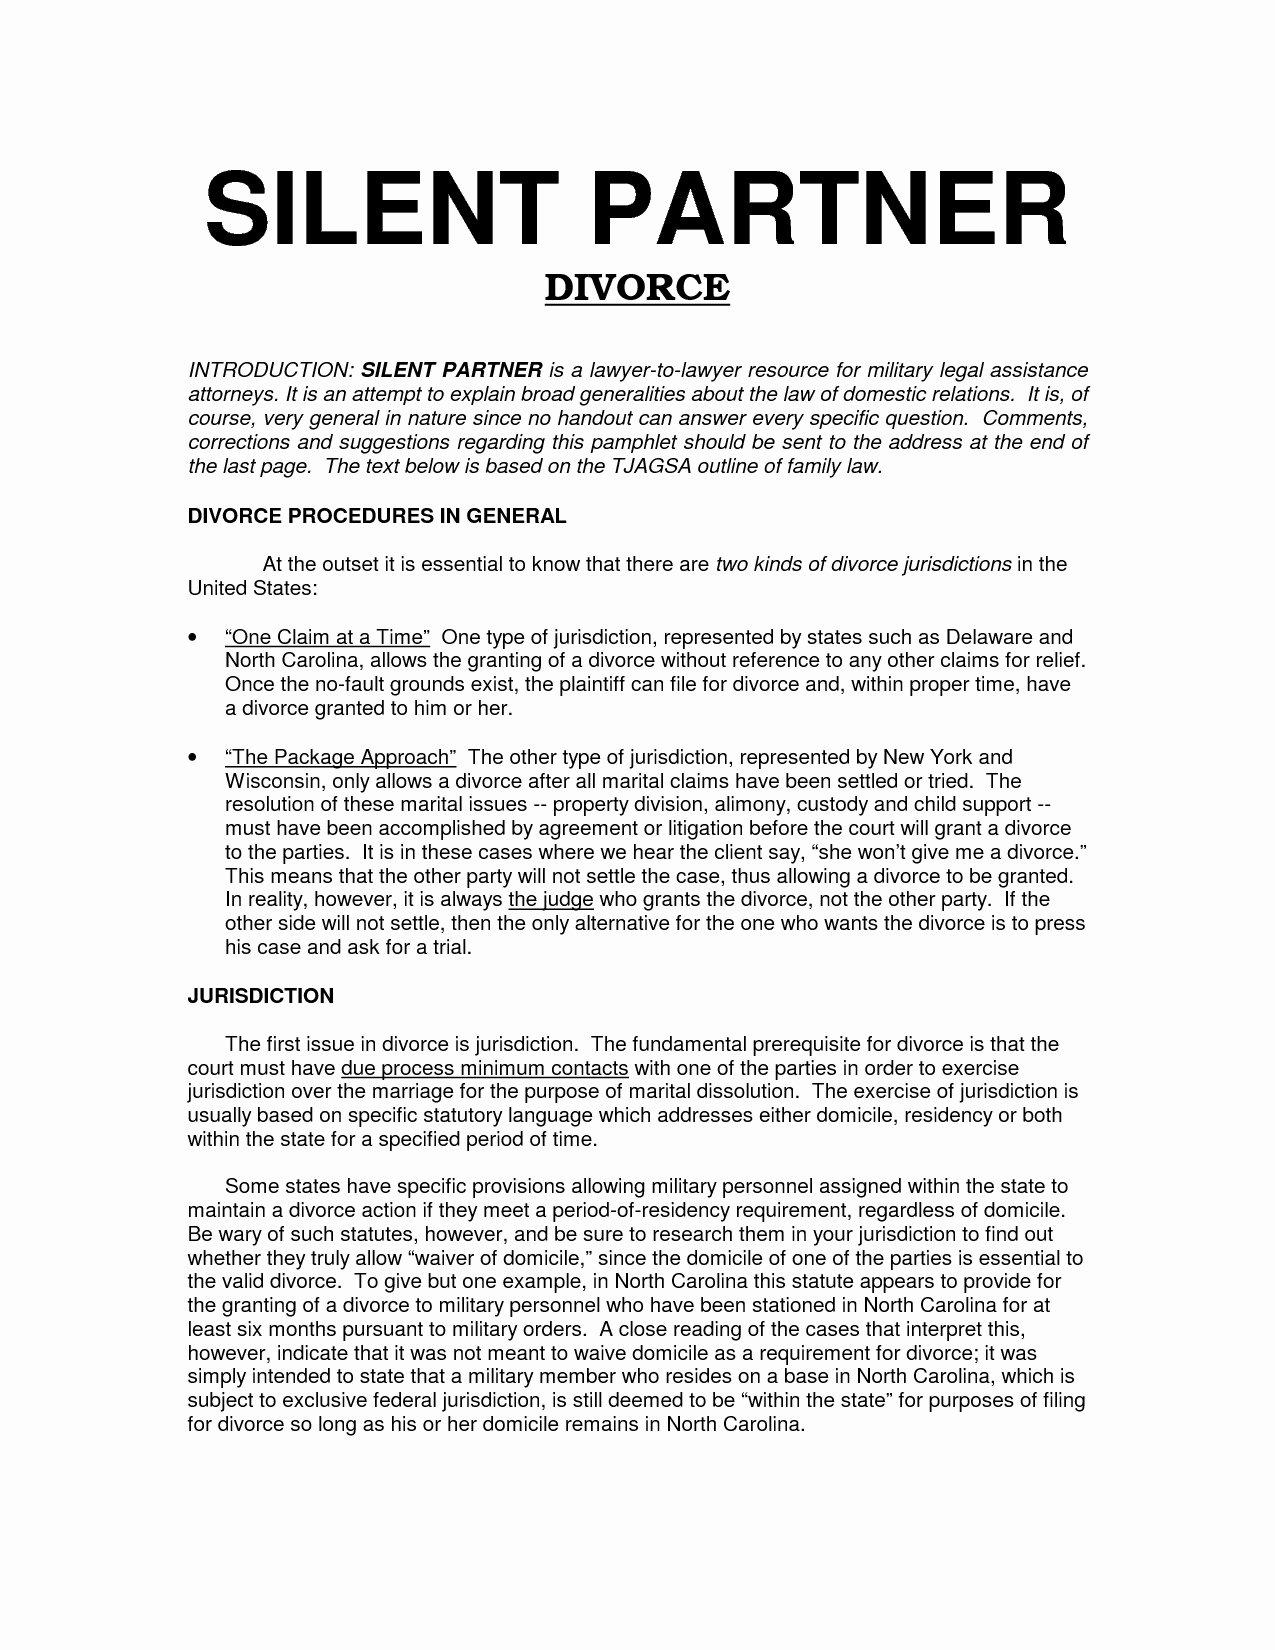 Affiliate Partnership Agreement Template Unique Silent Partnership Agreement Template Perfect Free Silent